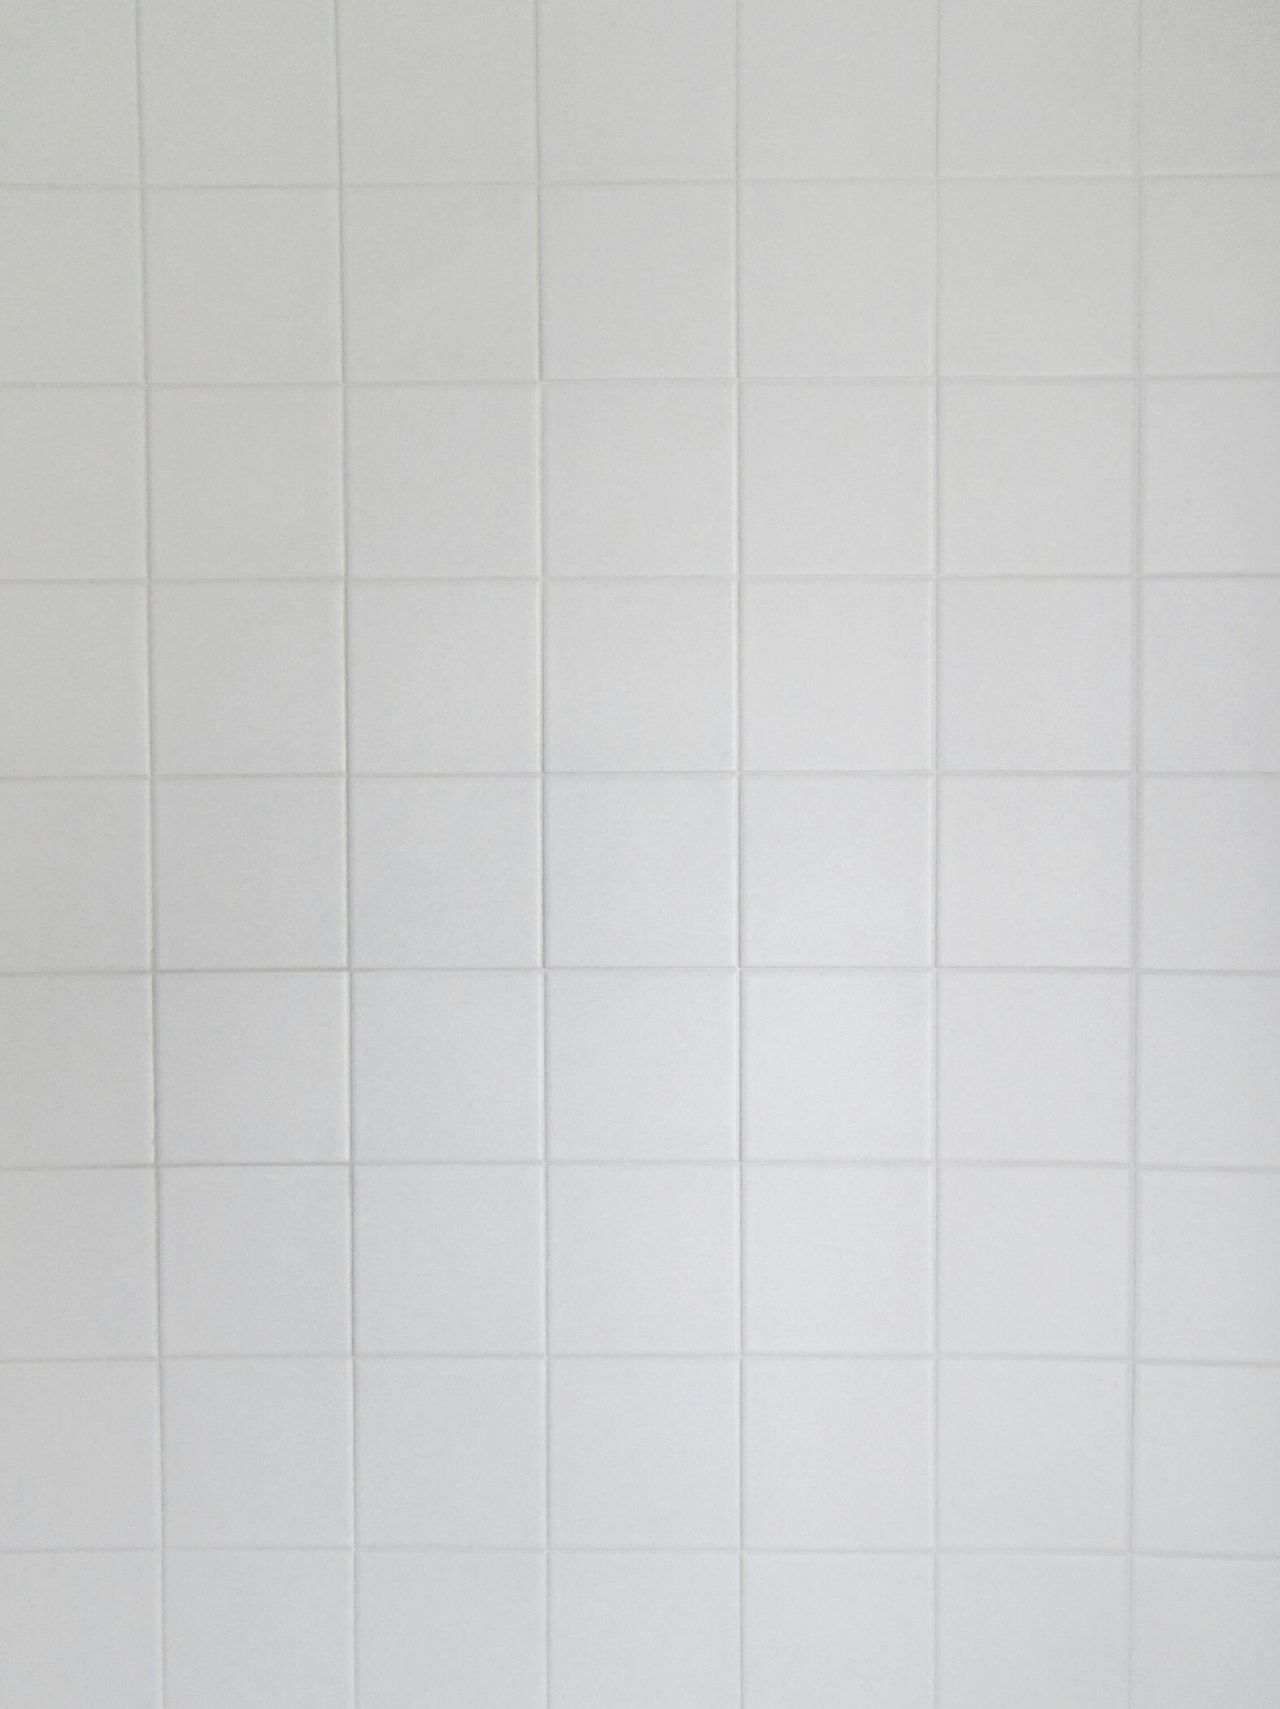 Italy ArchiTexture Textures And Surfaces Background Bath Tiles White Ceramic Tiles Kitchen Tiles Square Pattern Mosaic Tiles